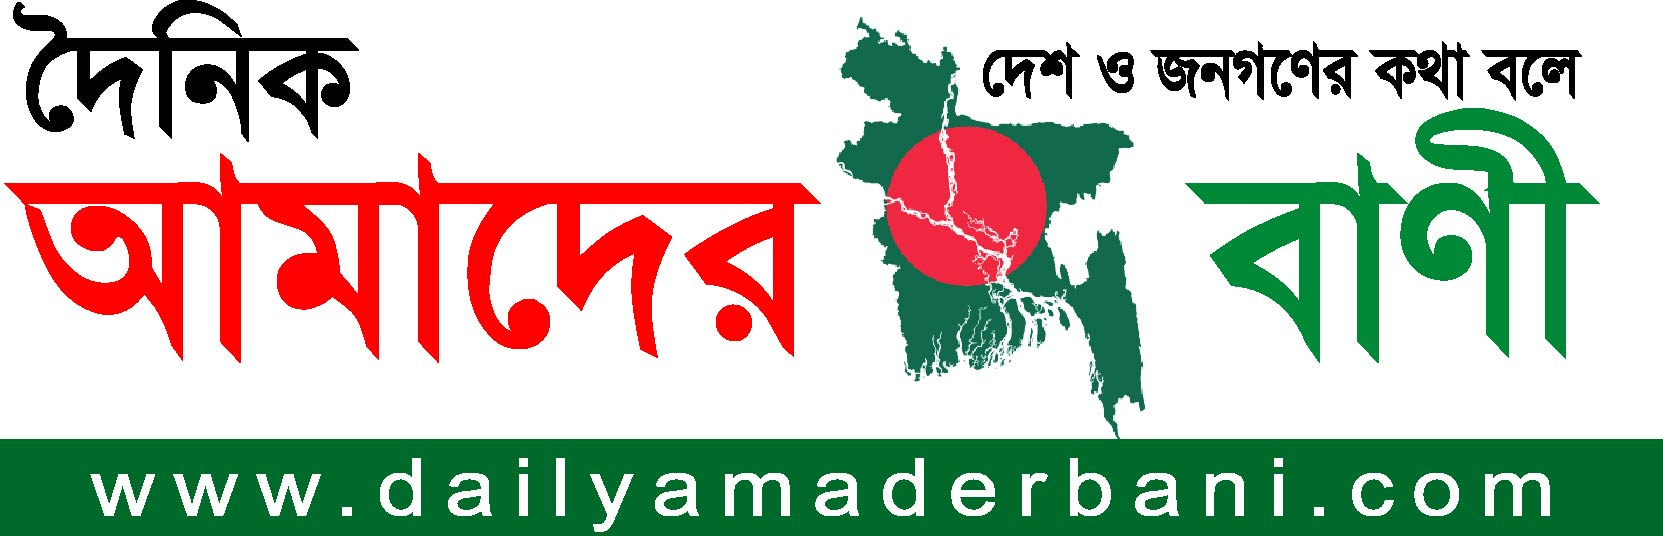 www.dailyamaderbani.com